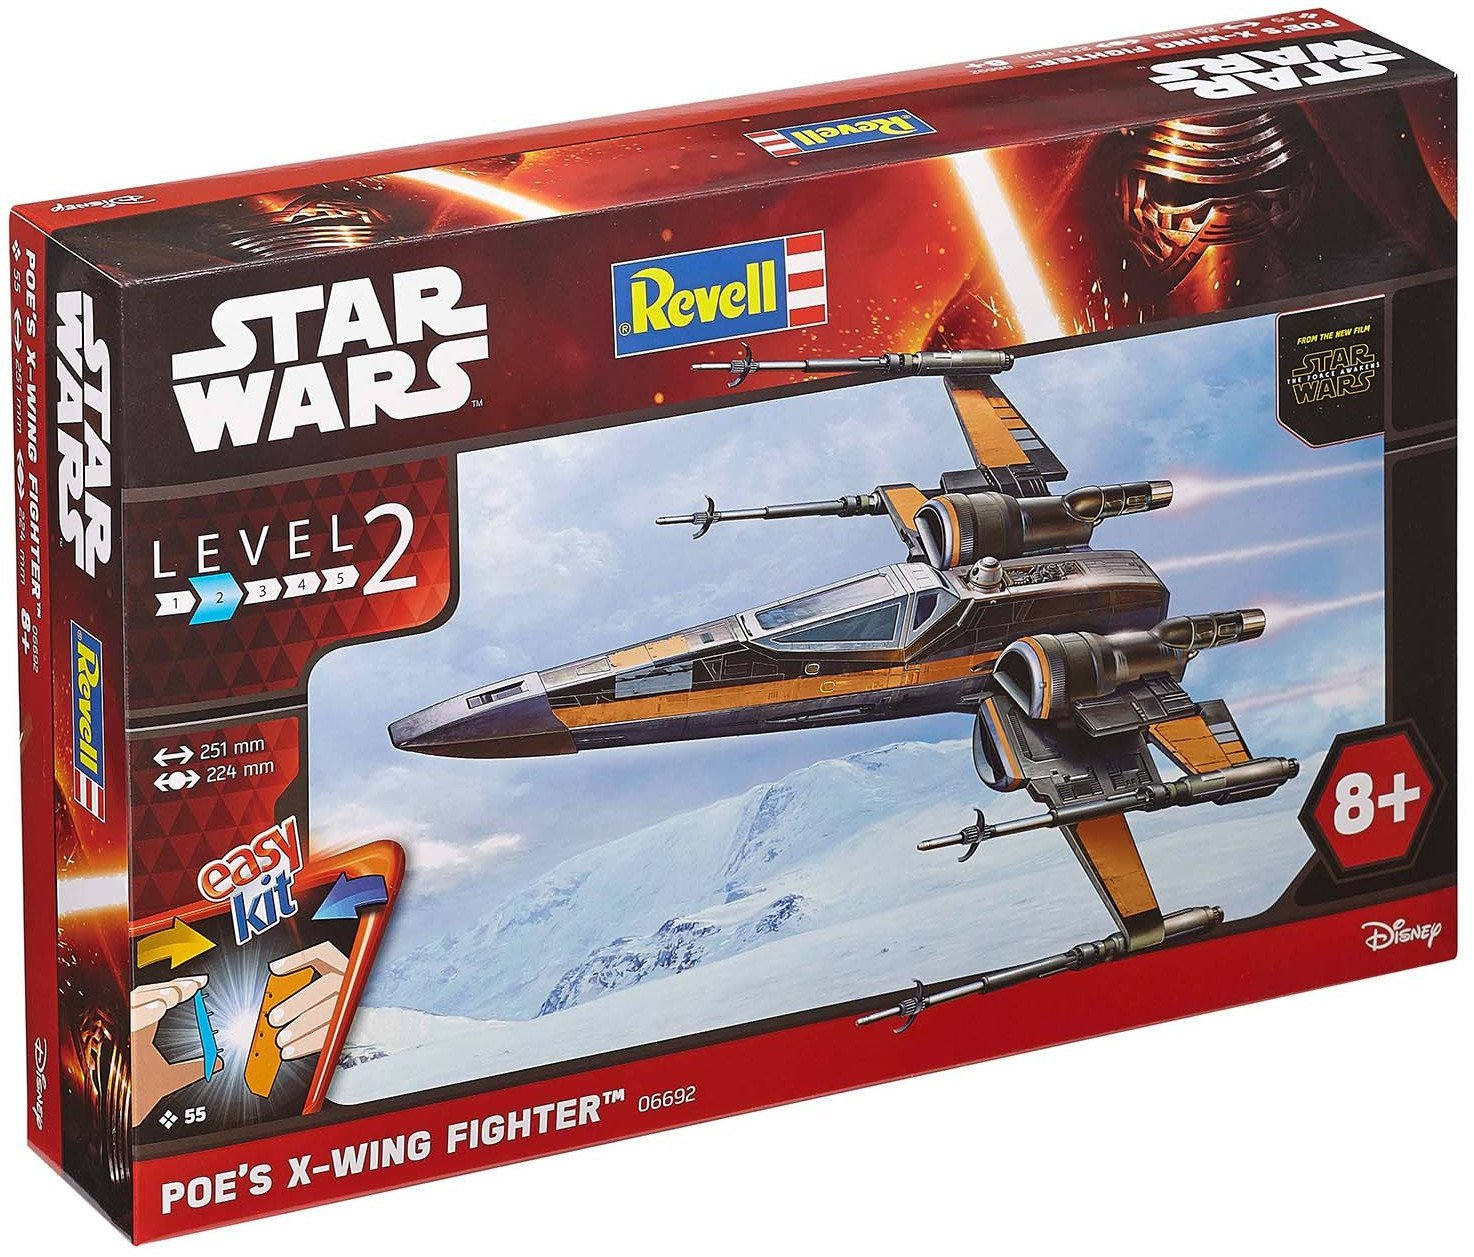 Star Wars Revell amazon